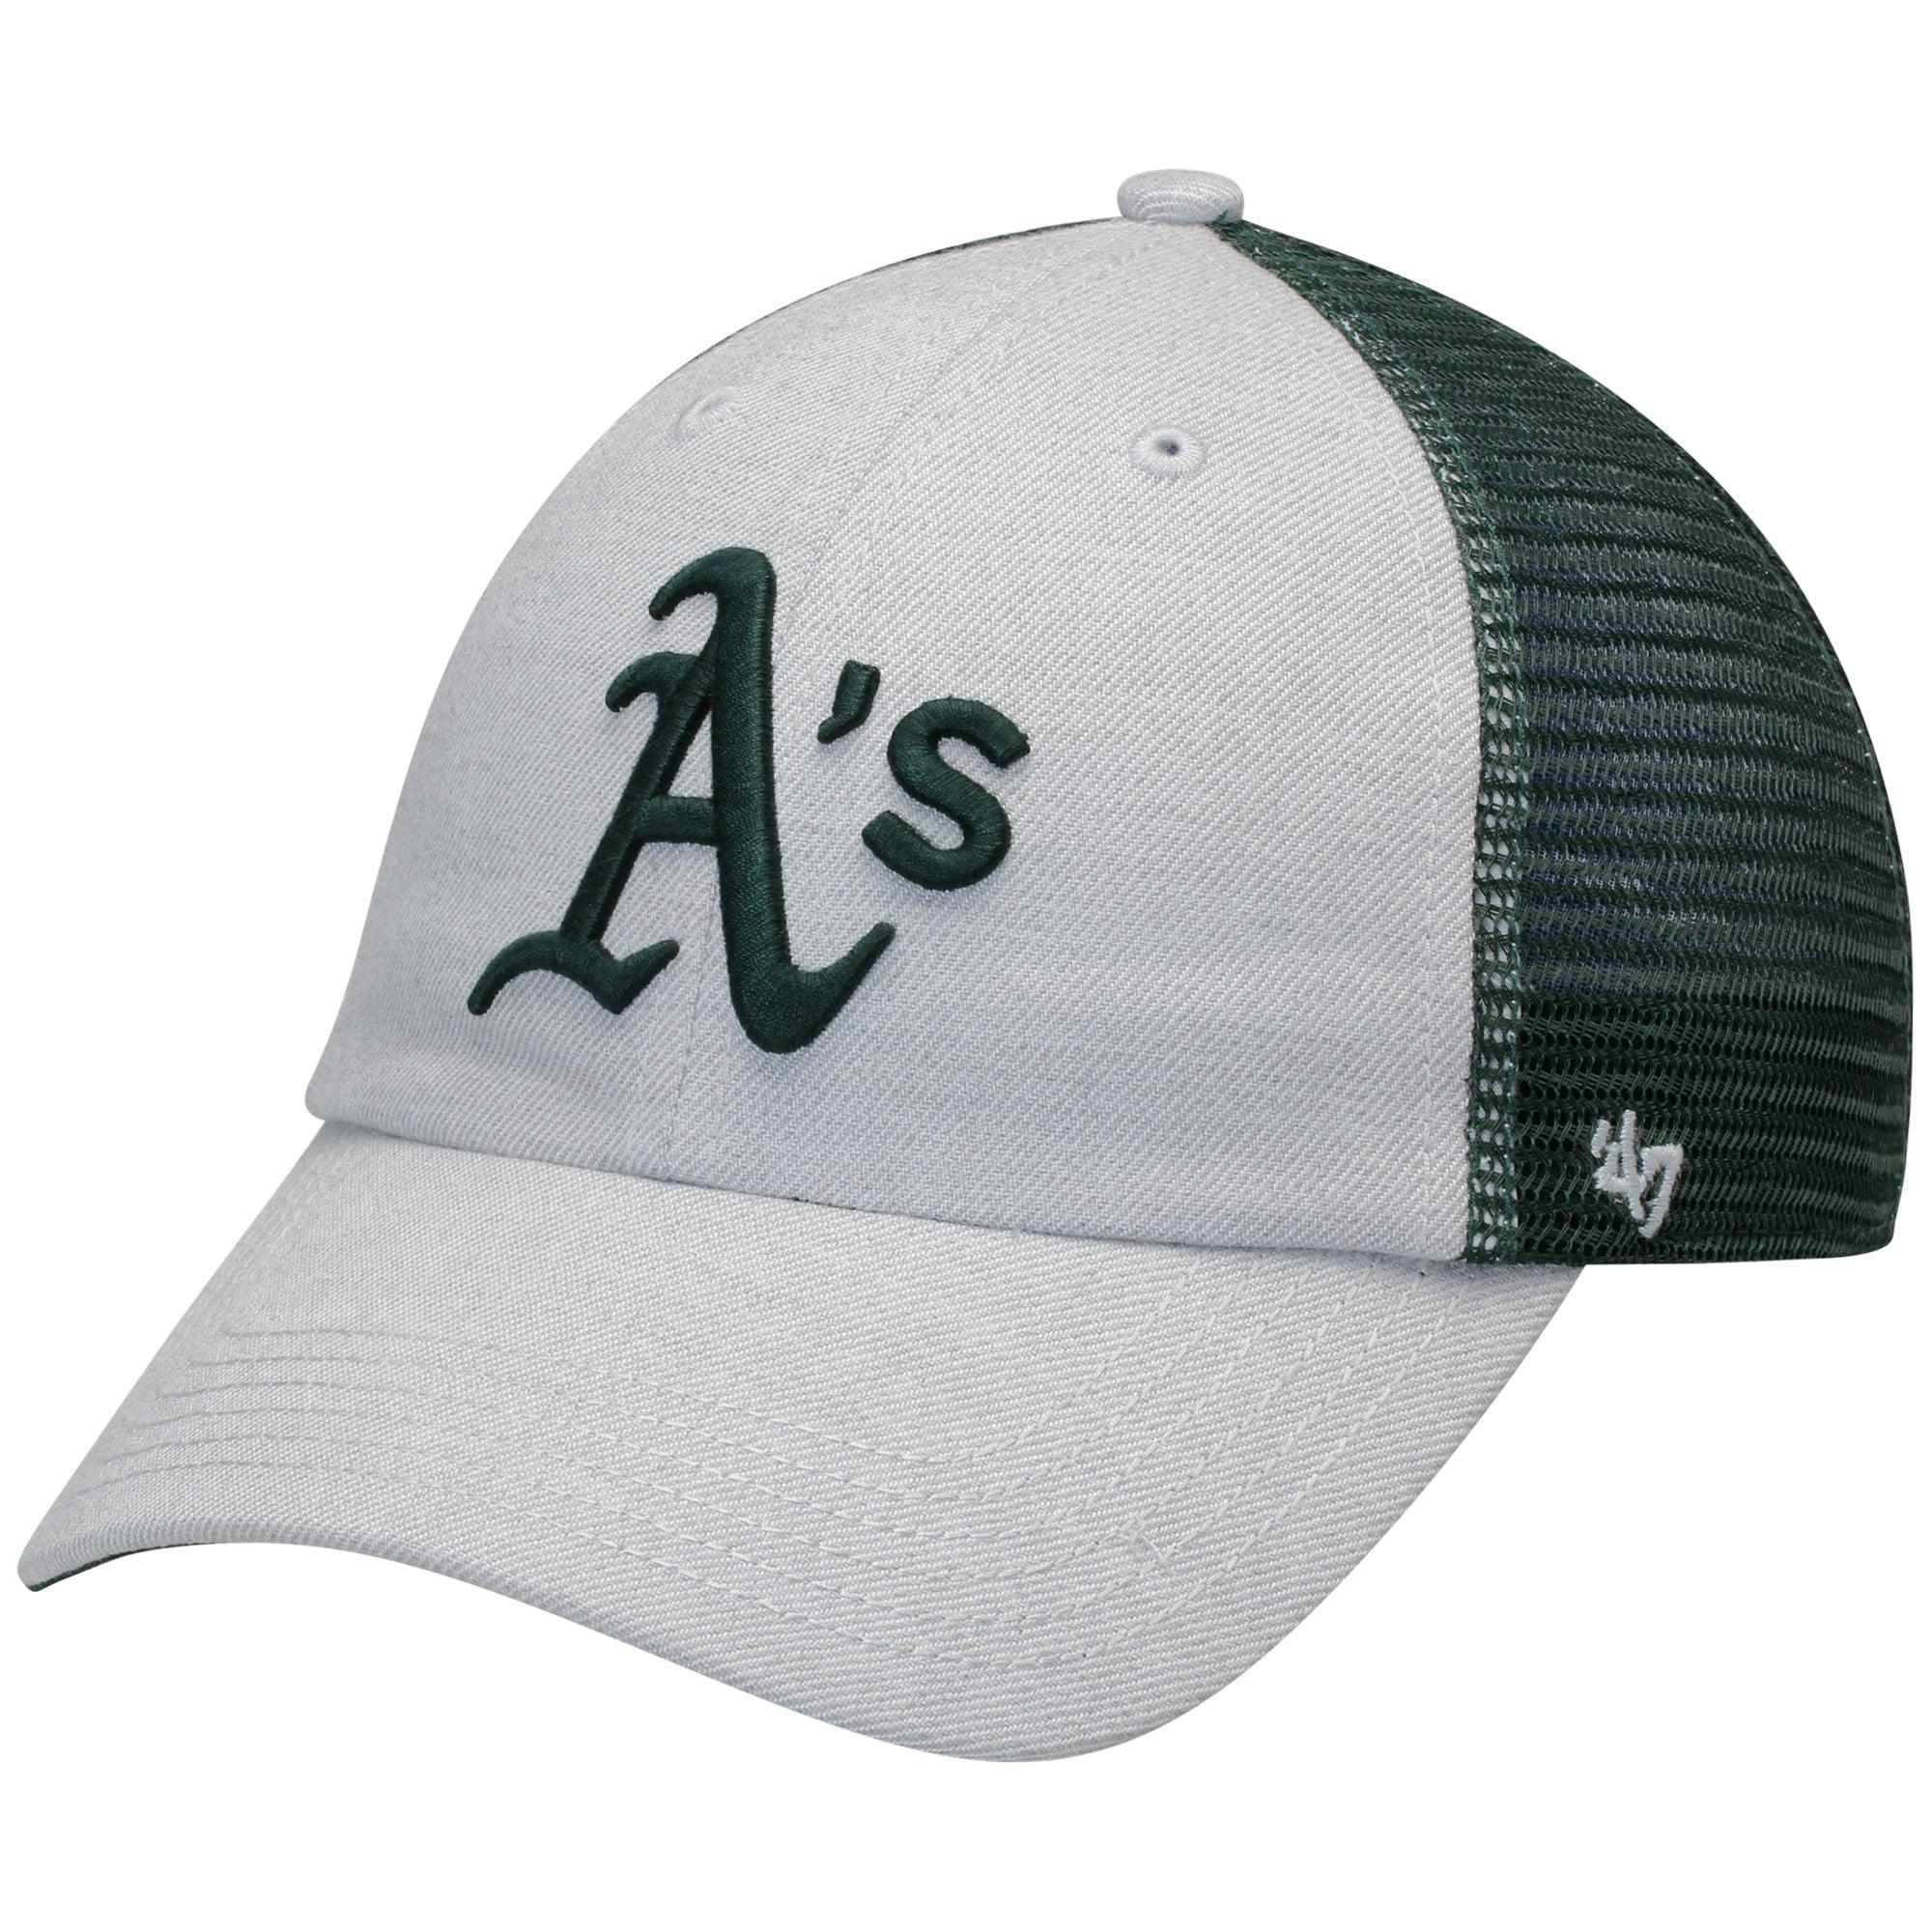 Oakland Athletics '47 Tamarac Clean Up Snapback Adjustable Hat - Gray/Green - OSFA